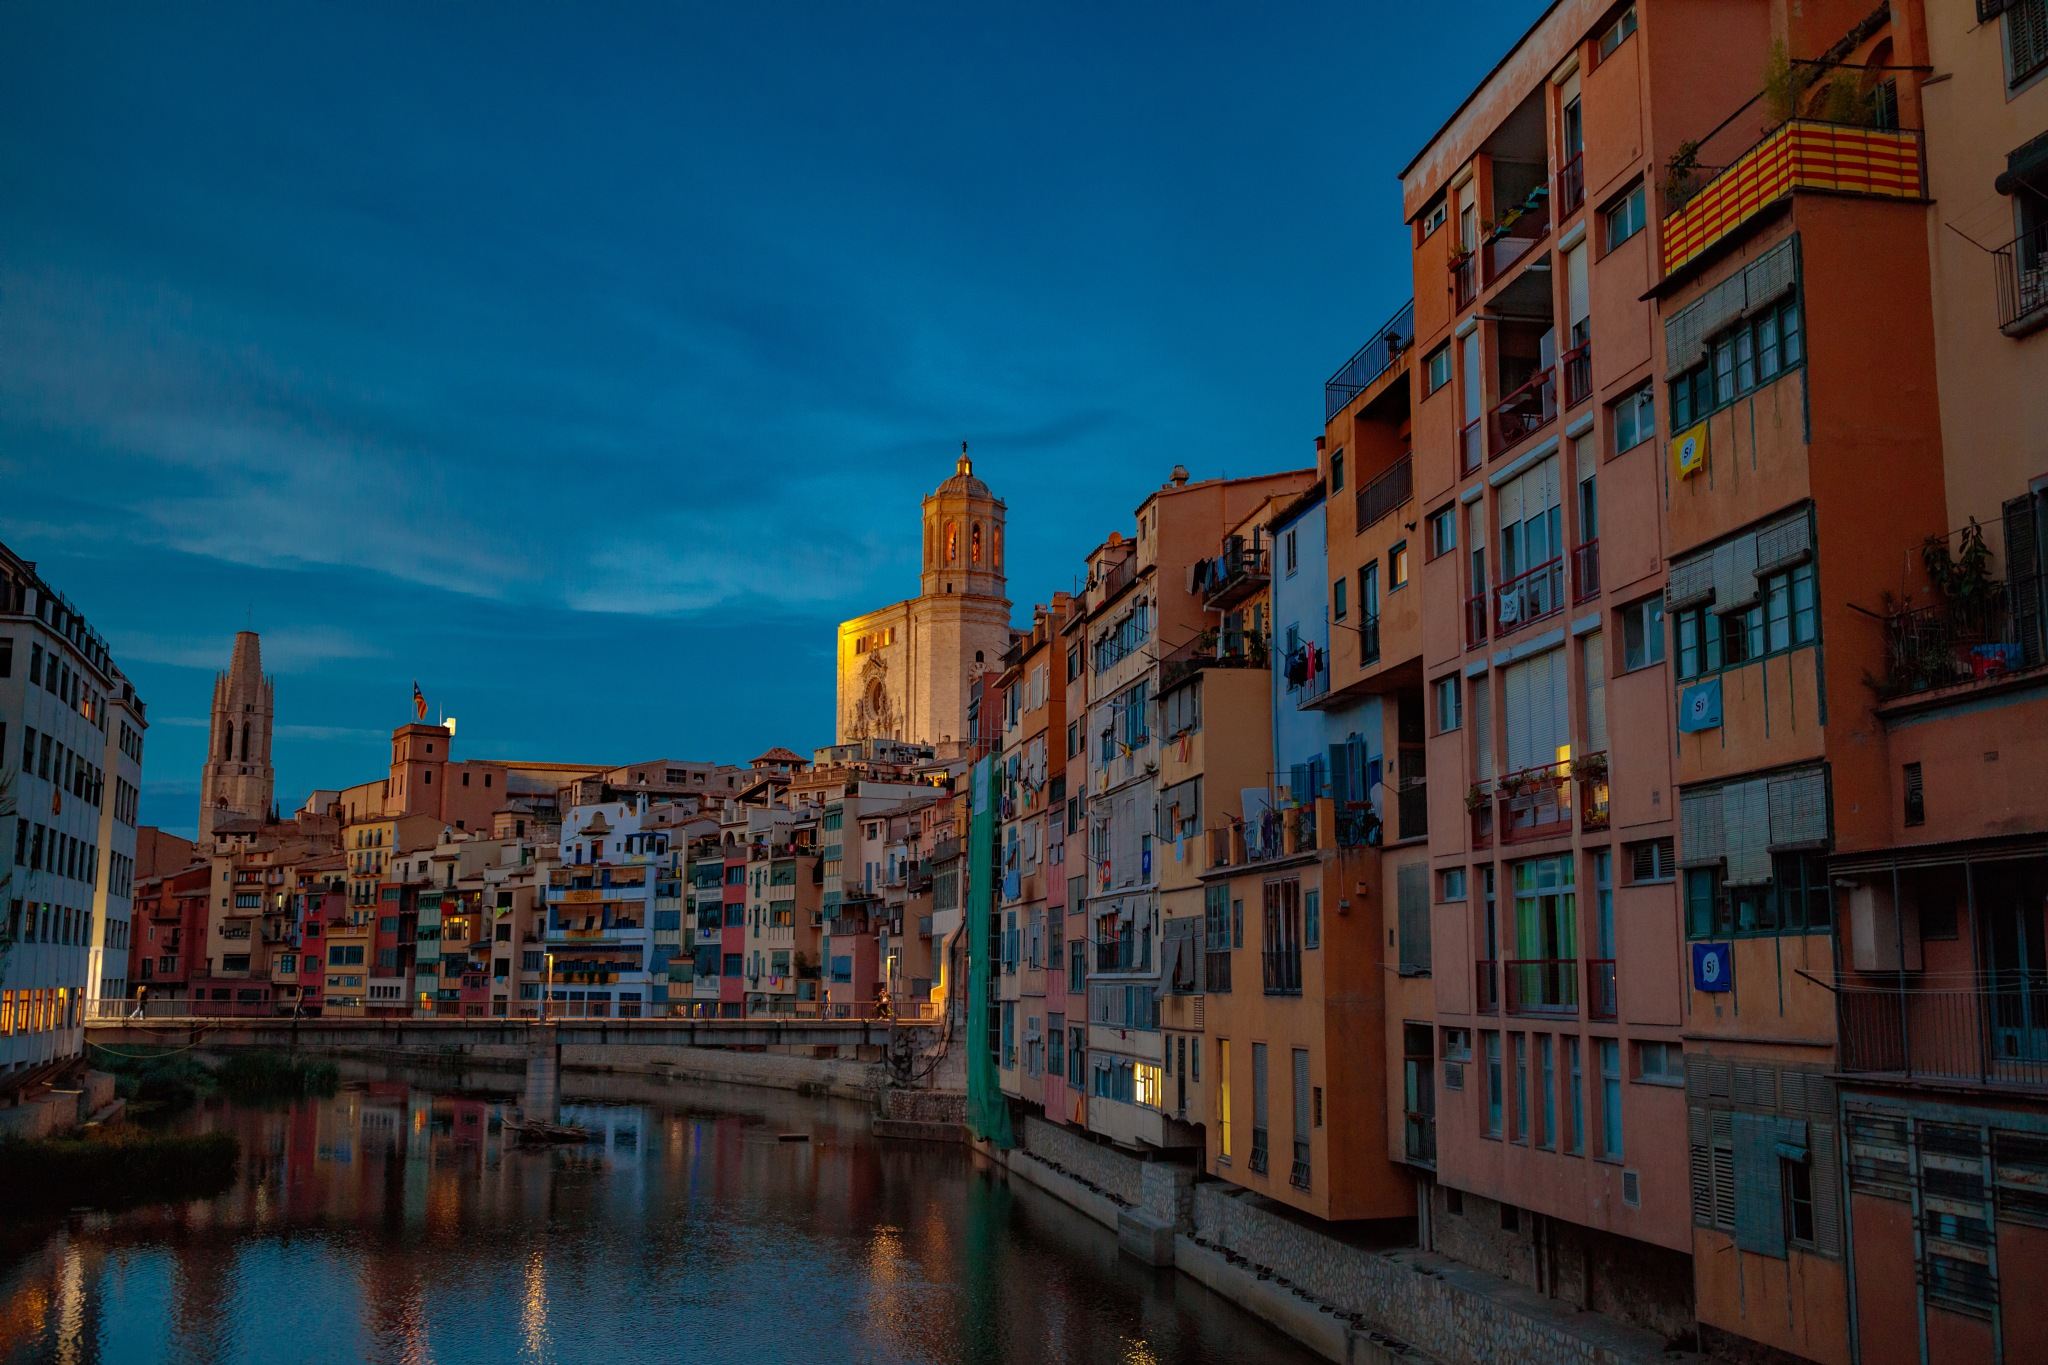 Girona at night by Roberto Gonzalo Romero